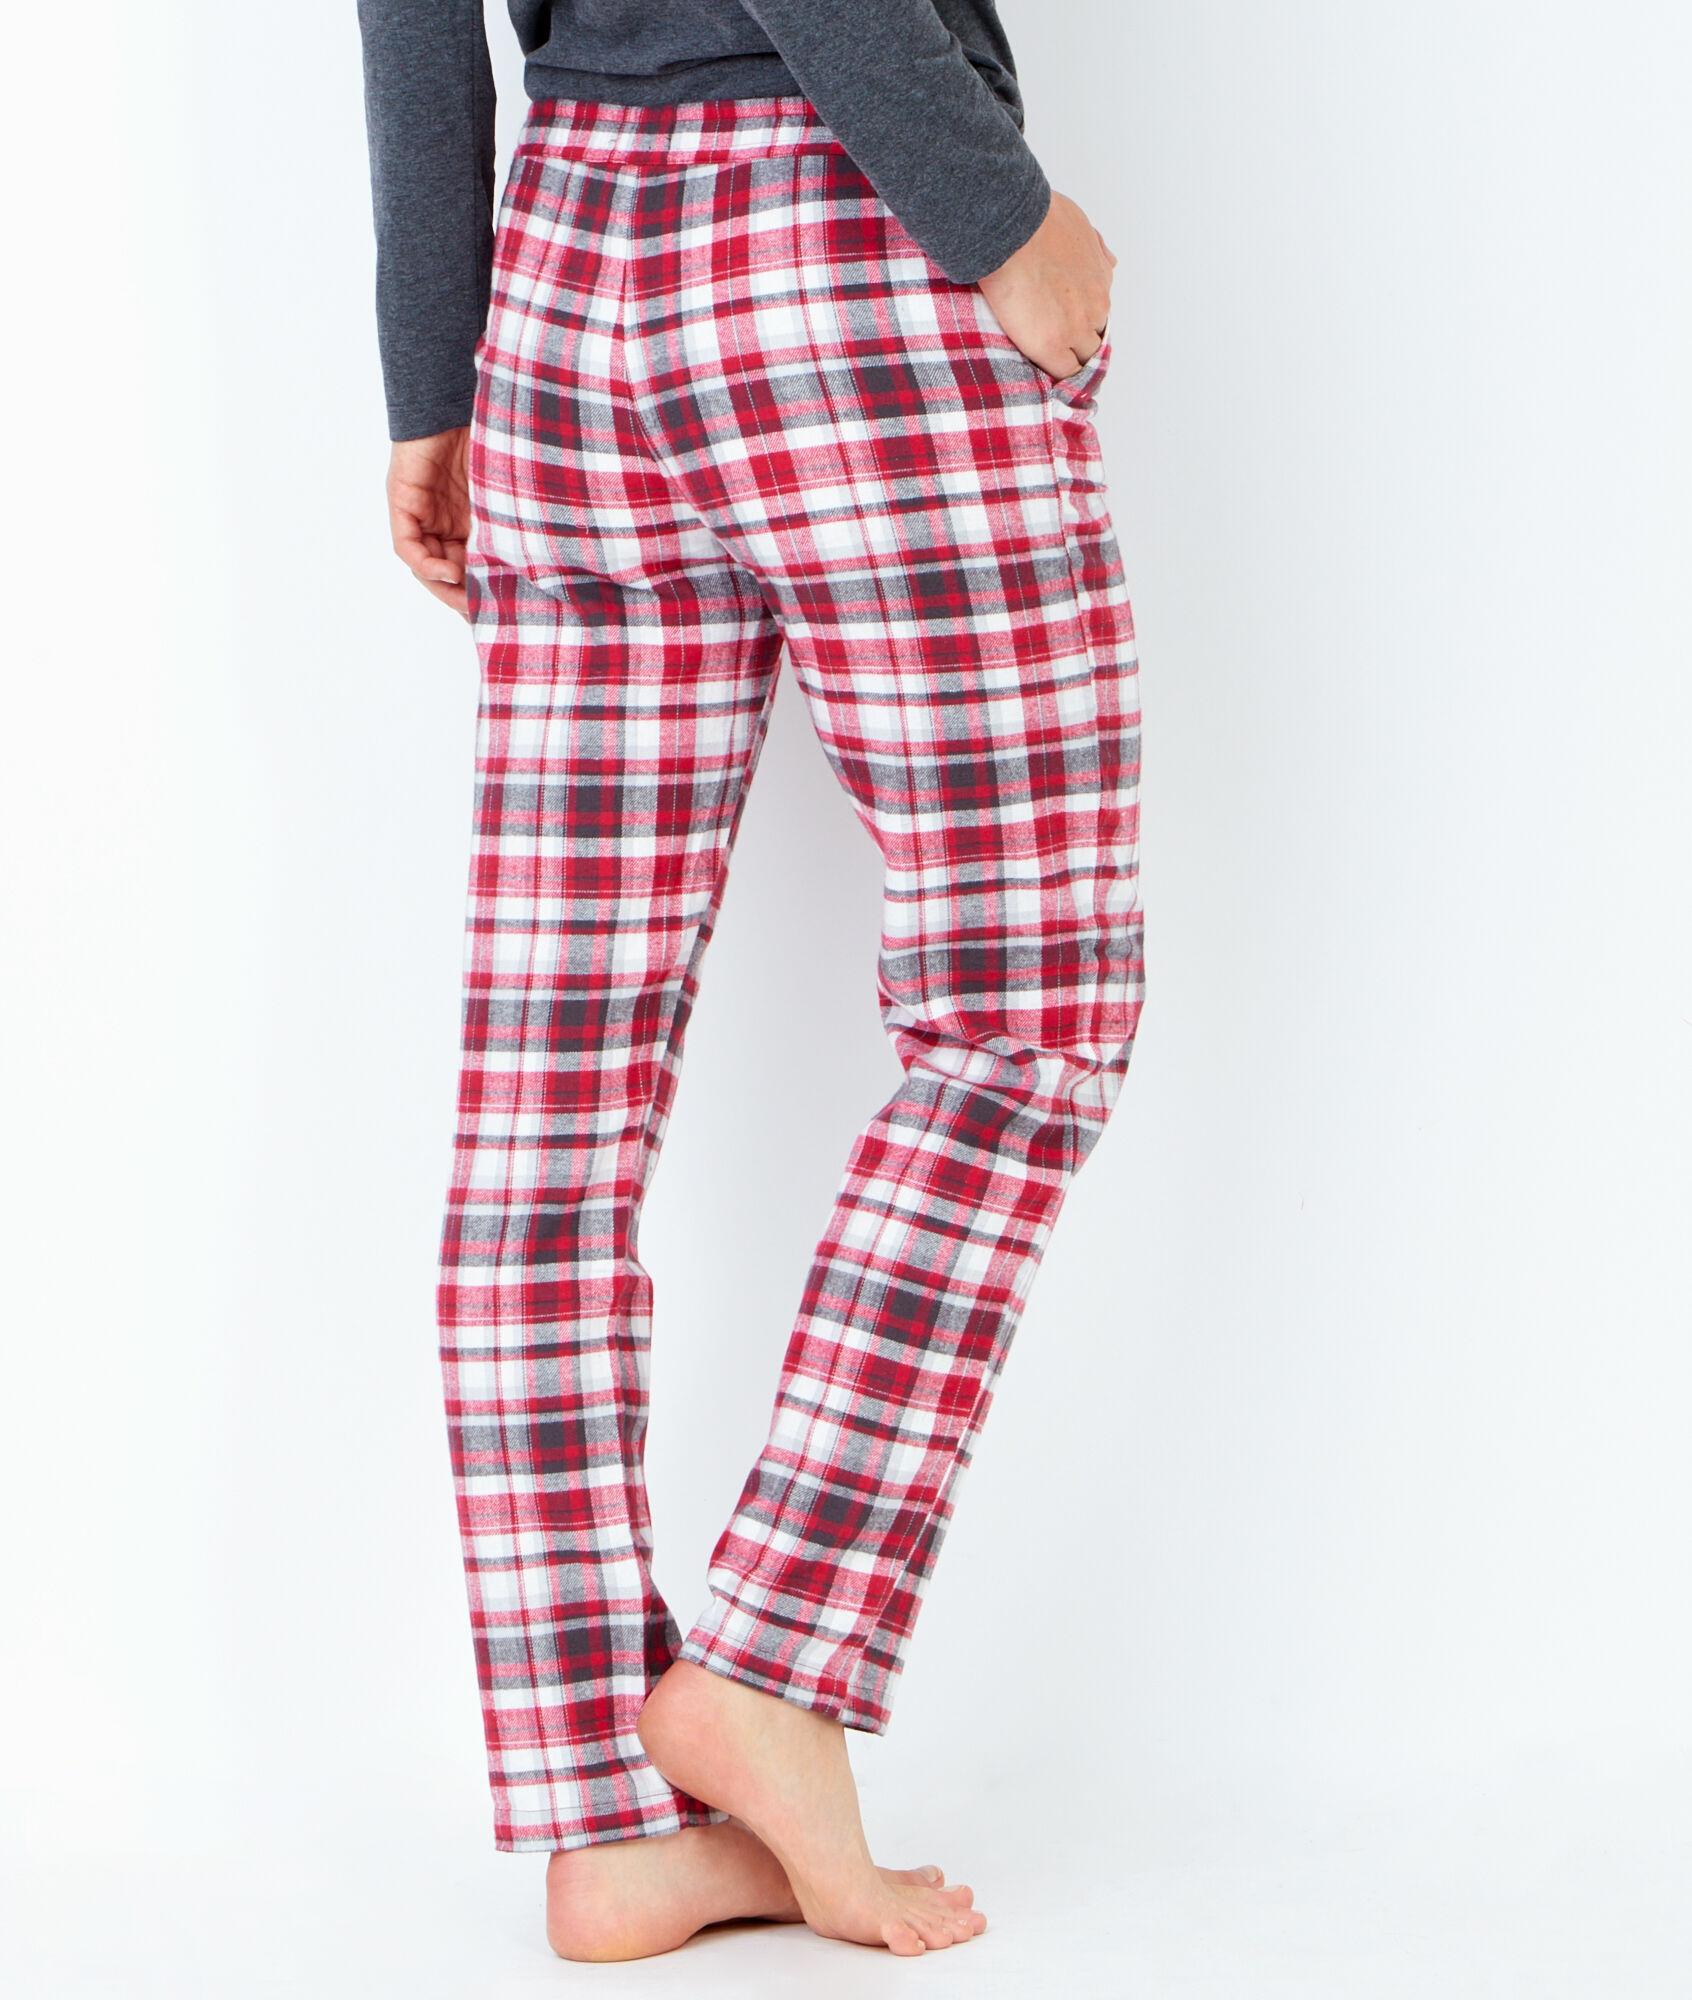 Jessica pyjama 3 pi ces pantalon carreaux et veste for Pyjama a carreaux